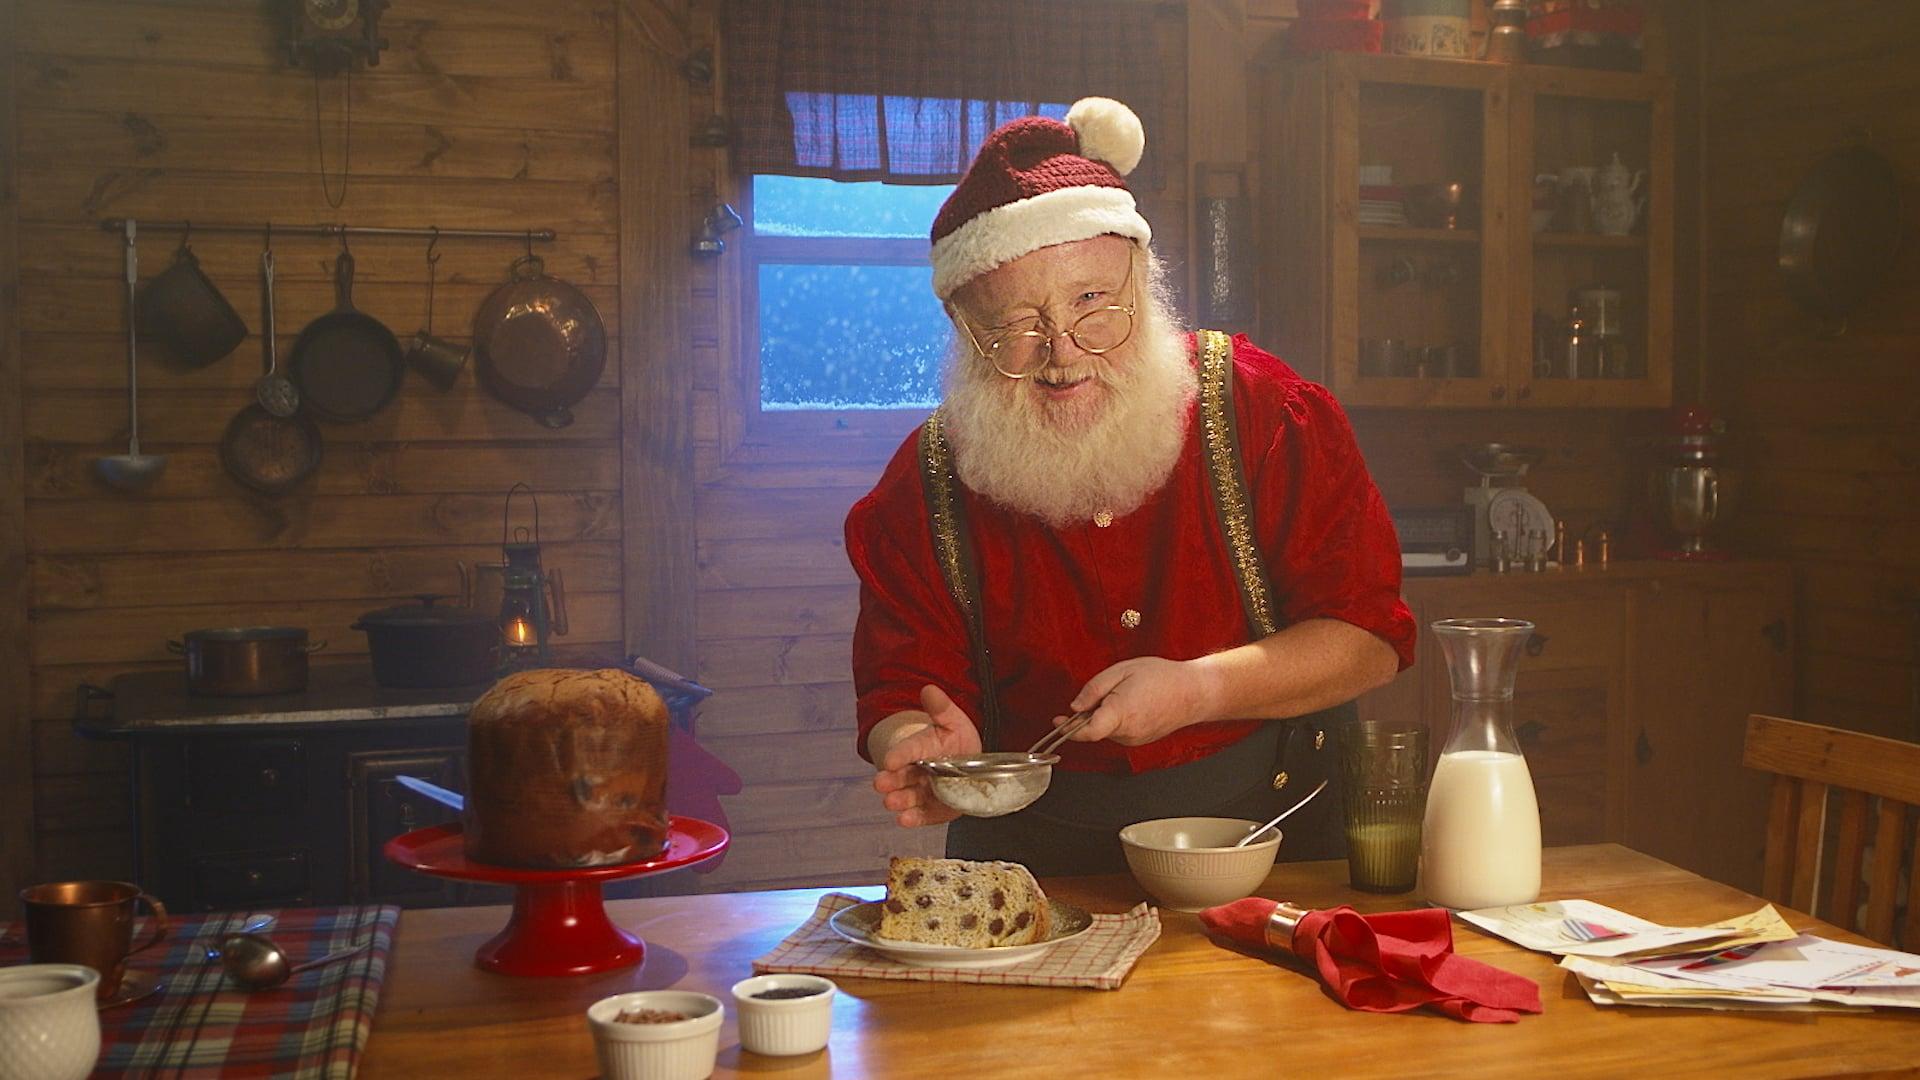 Plaza Sul | Gostosuras de Natal - Açúcar & Canela (Christmas Treats - Sugar & Cinnamon